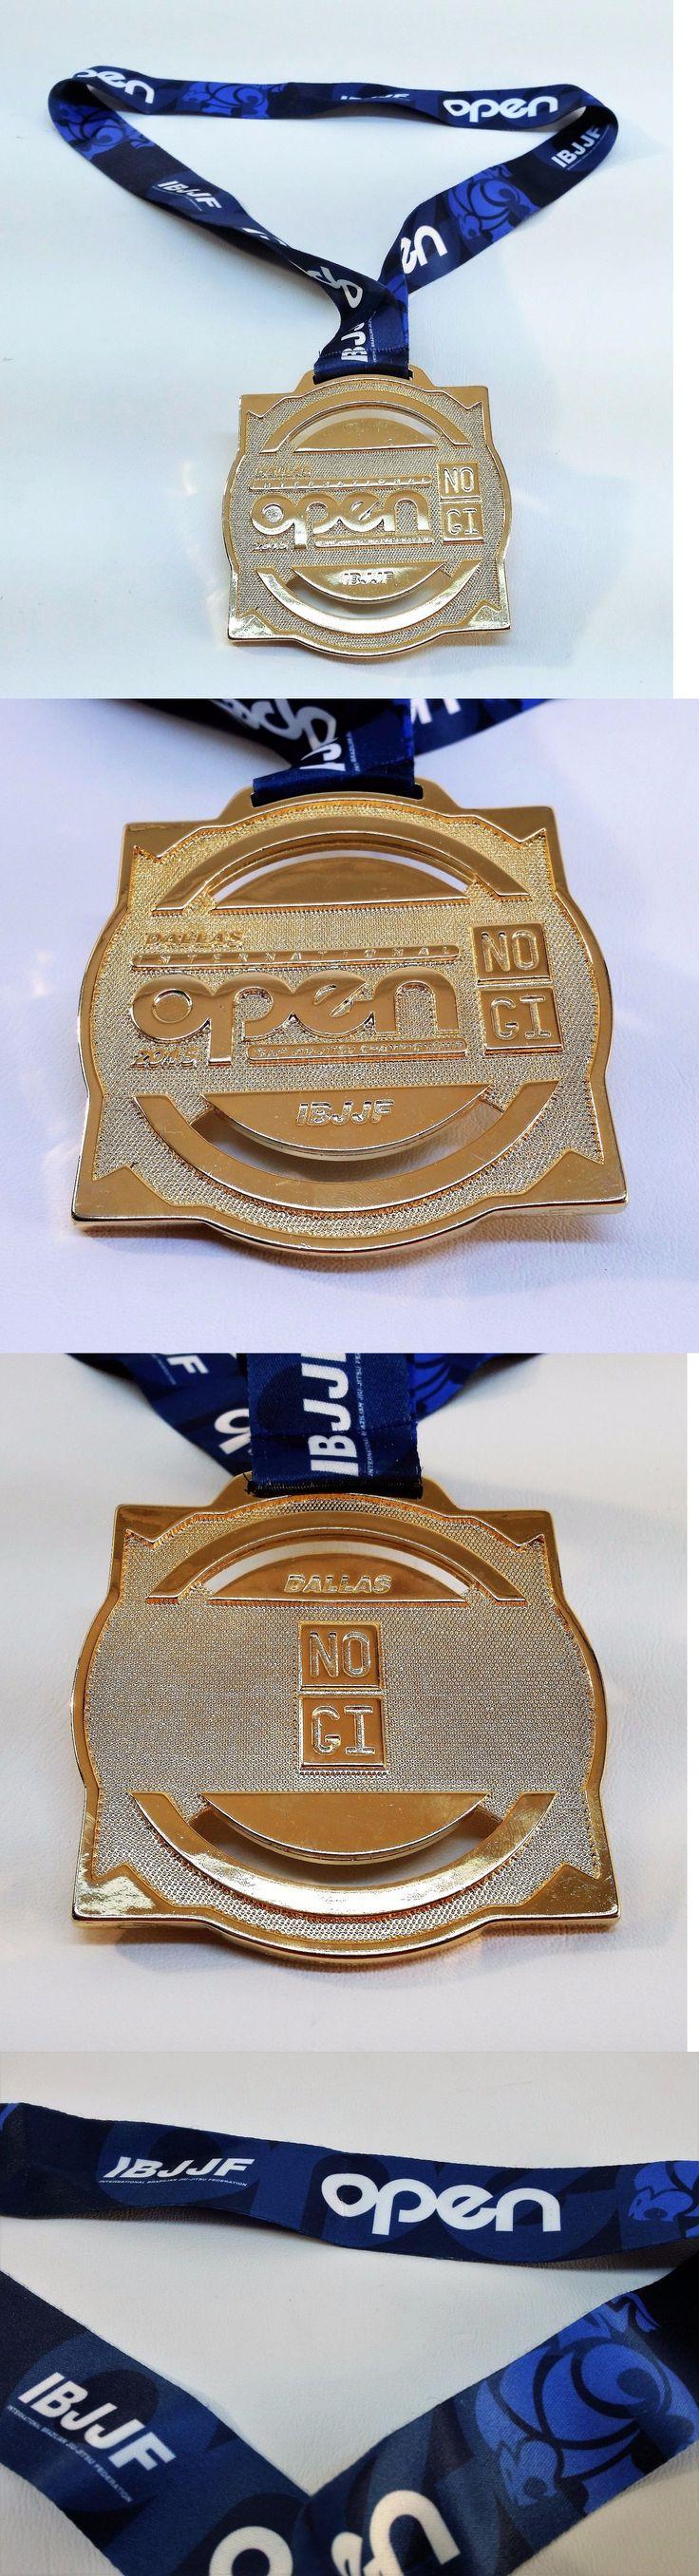 Other Combat Sport Supplies 16044: 2015 Dallas Tx Open Ibjjf Jiu-Jitsu Championship Gold Medal Trophy No Gi Award -> BUY IT NOW ONLY: $49.95 on eBay!